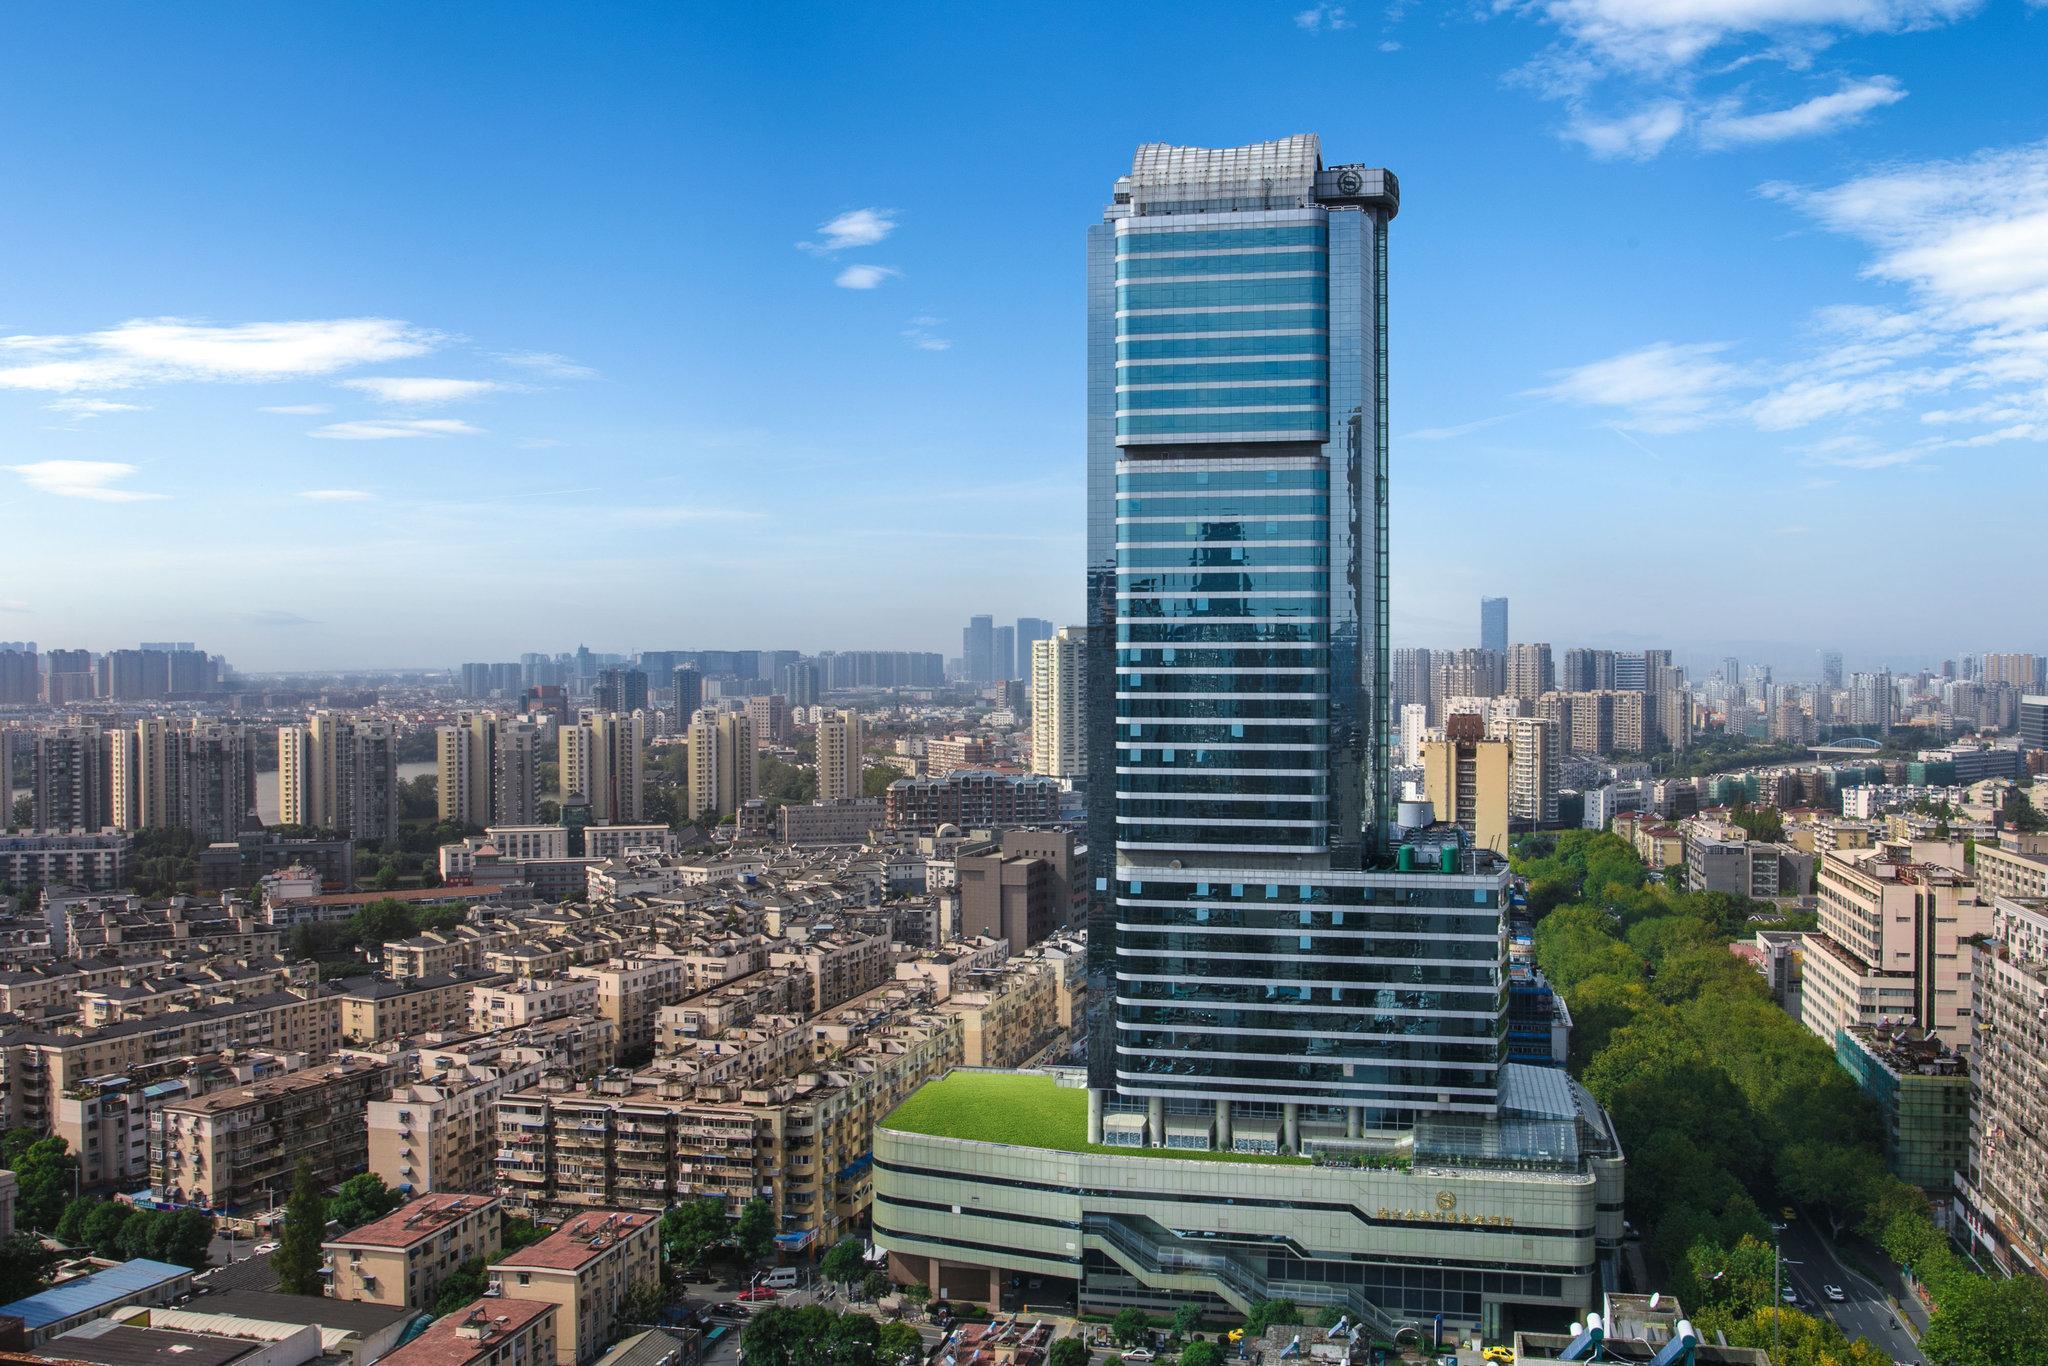 Jiang Ning District Hotels Nanjing China Hotels In Jiang